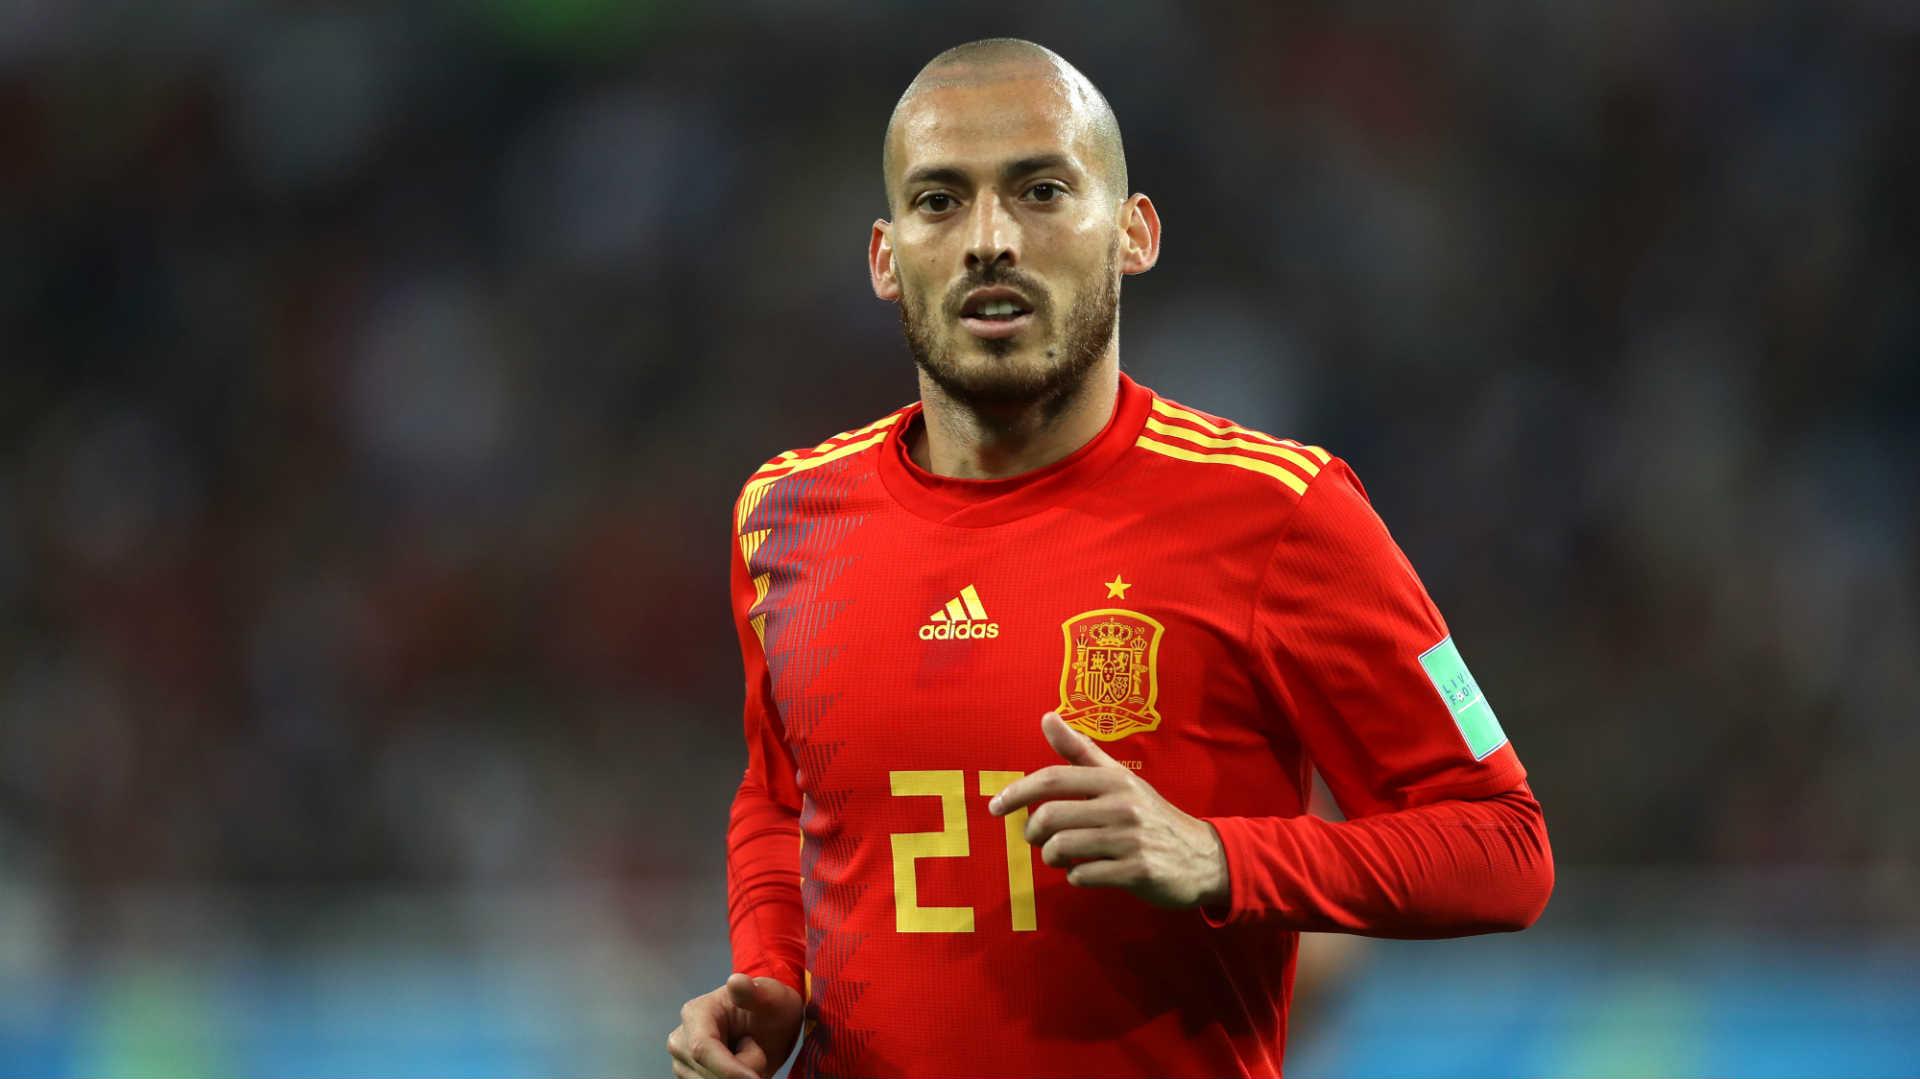 Image result for ซิลบาประกาศลาทีมชาติสเปน